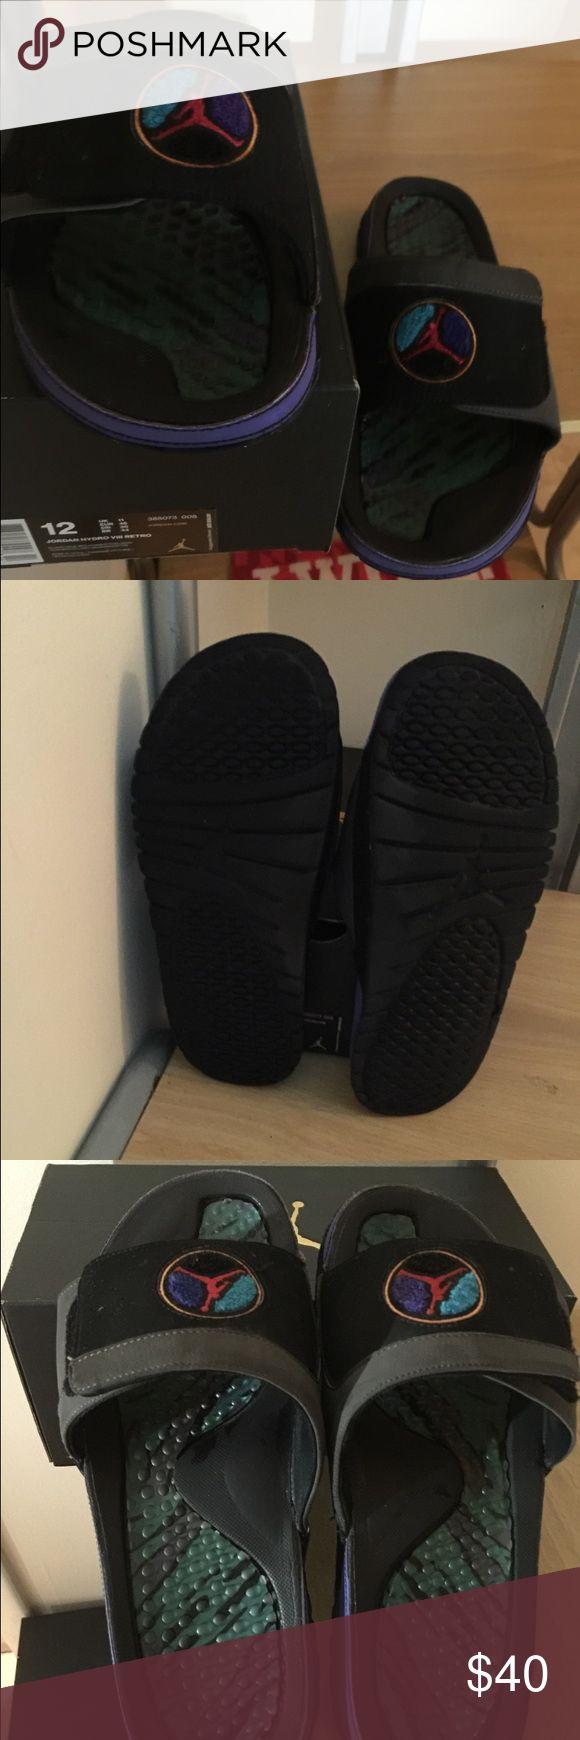 Men's Air Jordan Aqua 8 flip flops These Jordan flip flops are perfect to wear around the house or in hot weather. Price negotiable Jordan Shoes Sandals & Flip-Flops